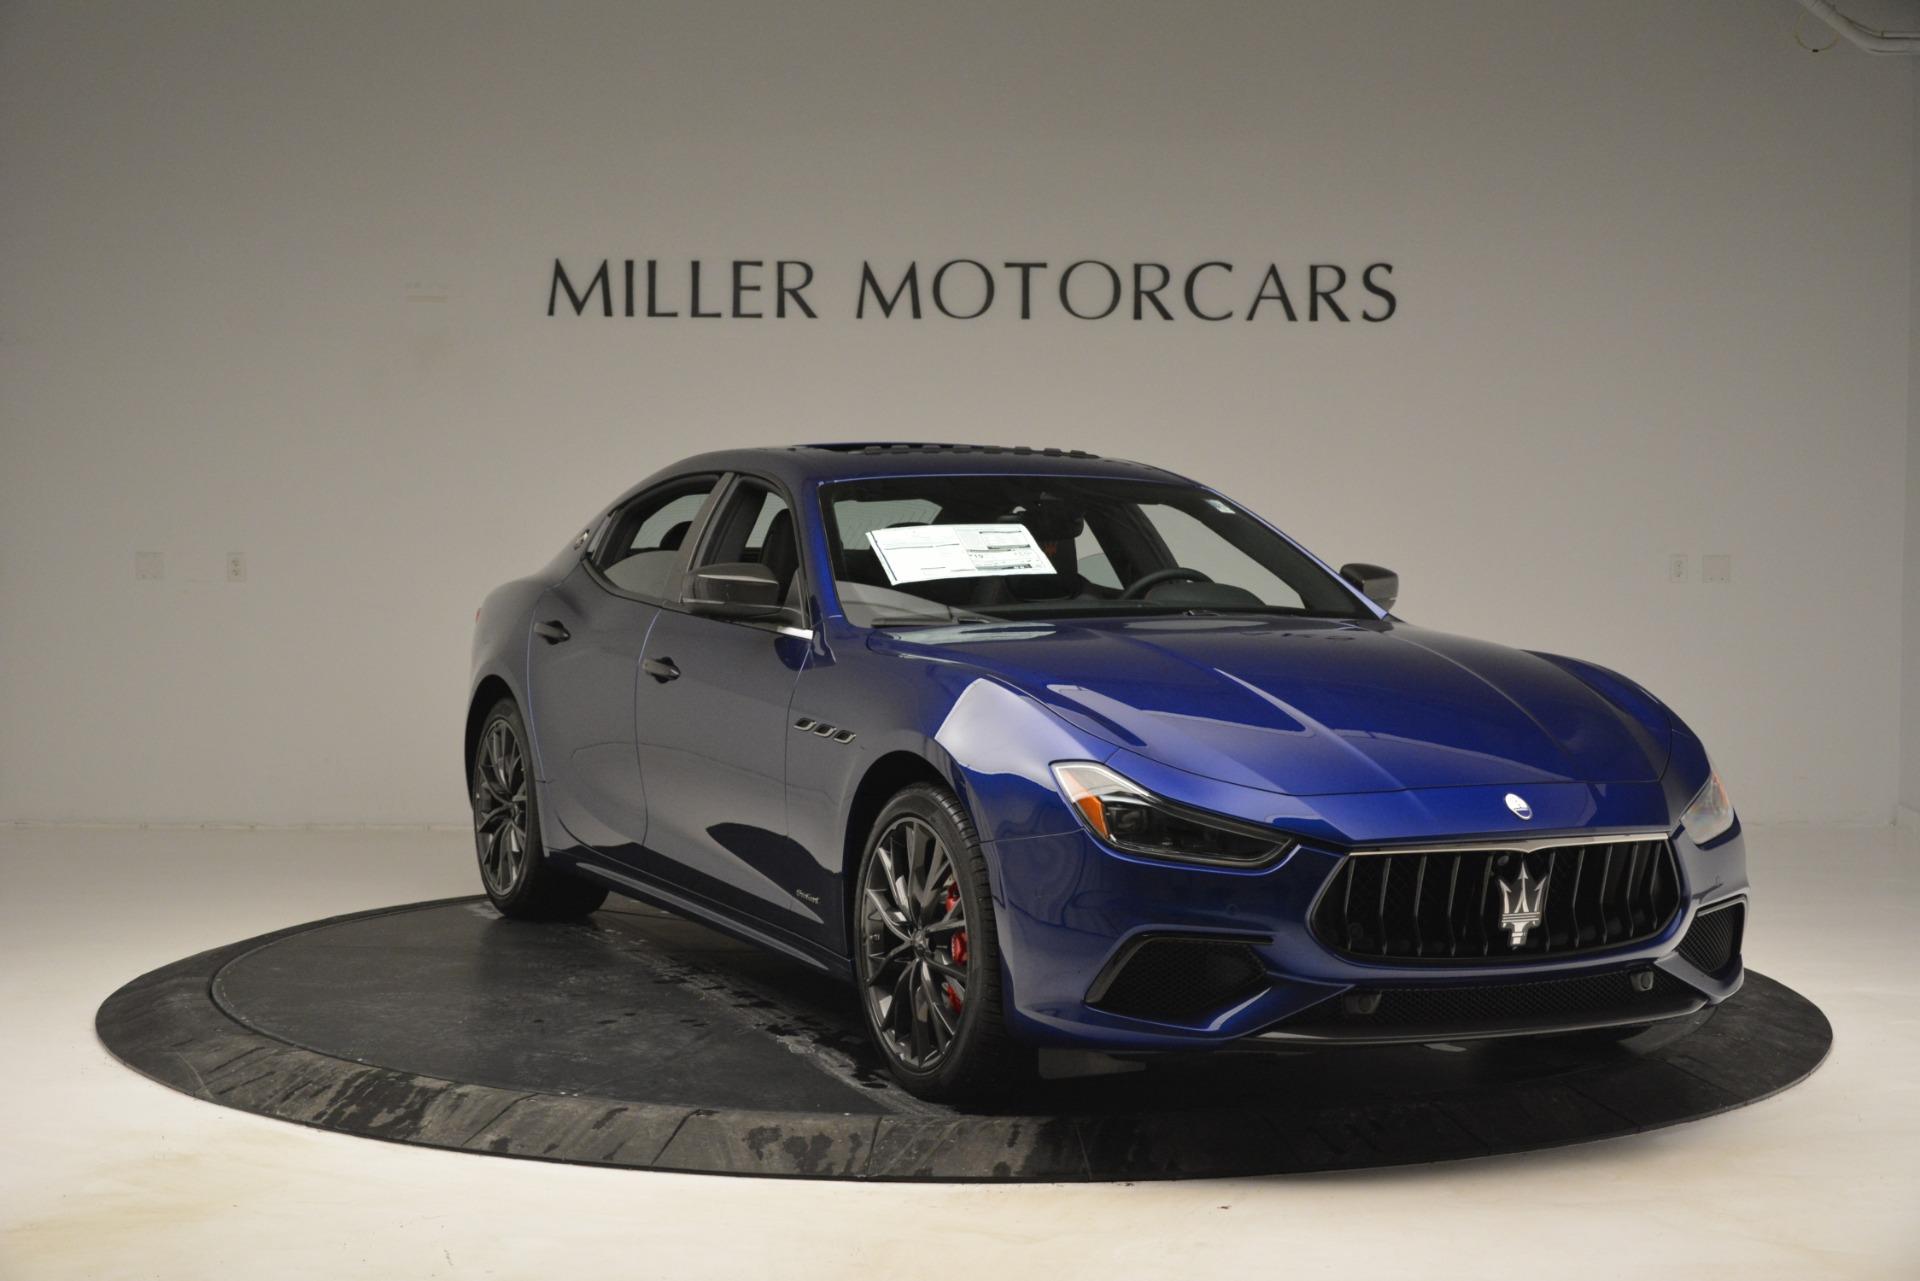 New 2019 Maserati Ghibli S Q4 GranSport For Sale In Westport, CT 2928_p11